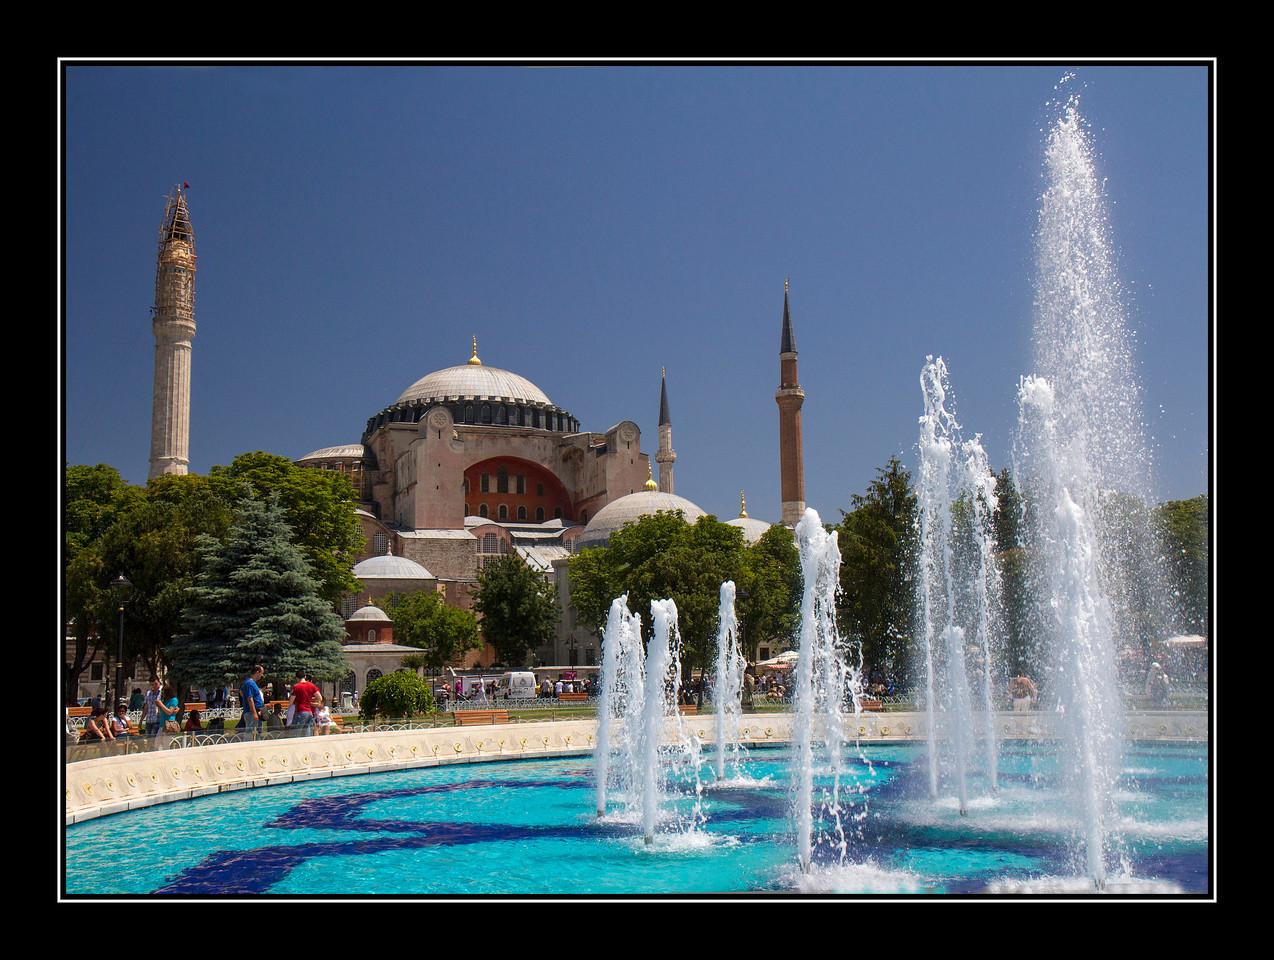 IMAGE: https://photos.smugmug.com/Travel/Istanbul/i-Vmww4wZ/0/4826a6a4/X2/Hagia%20Sophia%20Fountains-X2.jpg